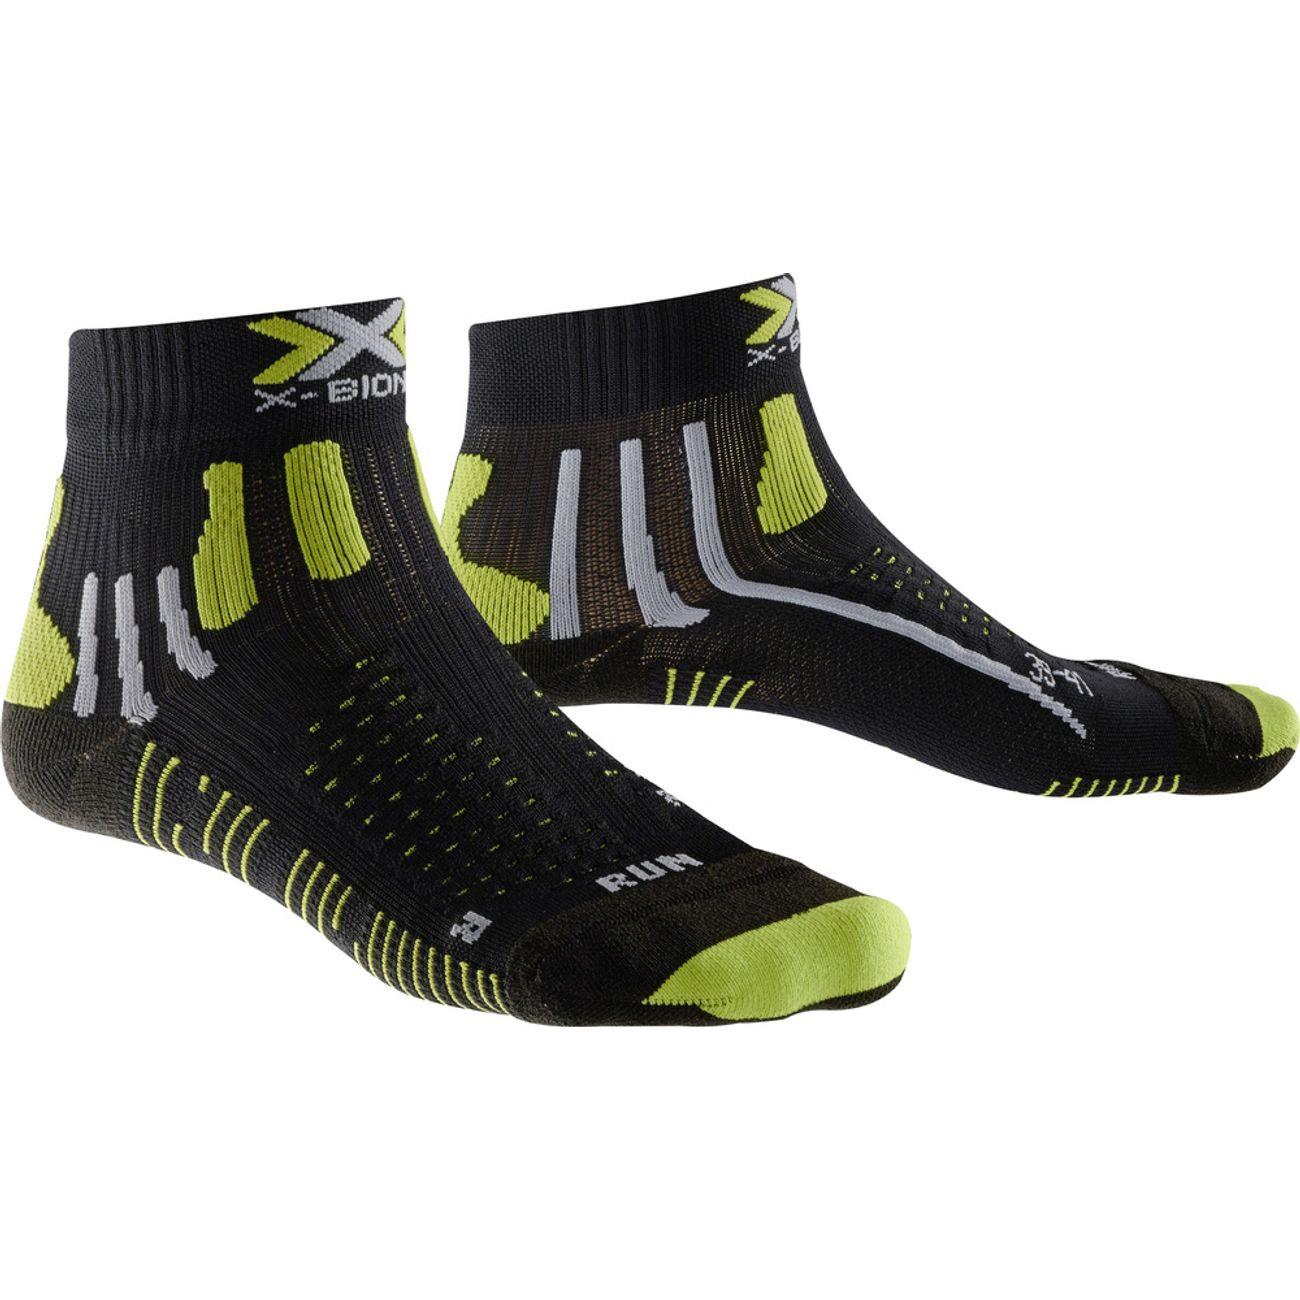 Homme Course Chaussettes Pied Running À X bionic Effektor Xbs Rj354LAq